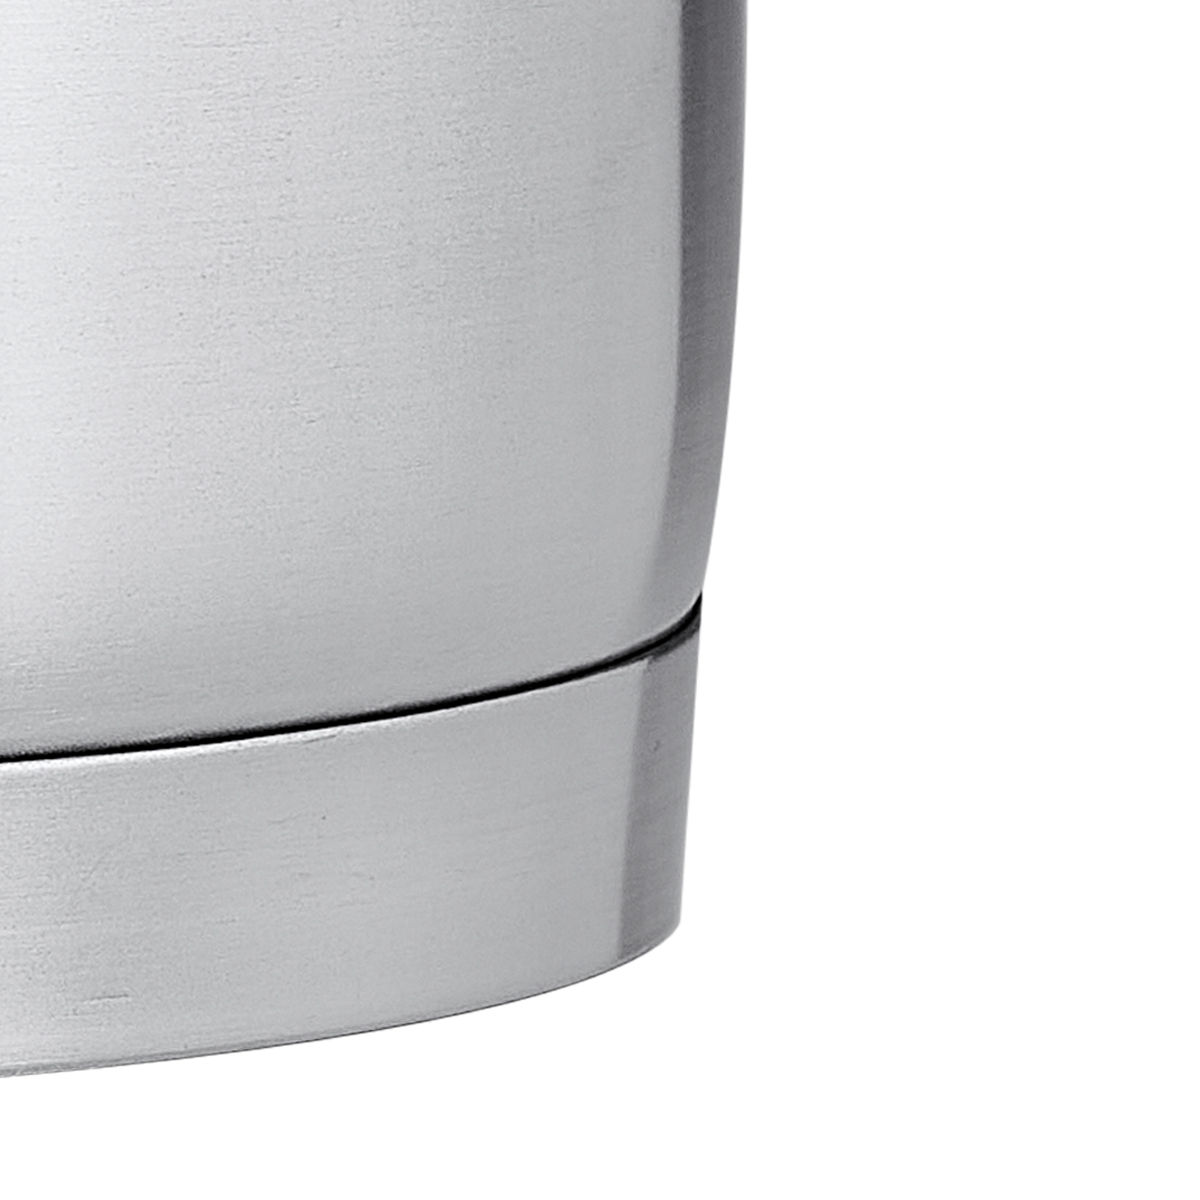 Korkmaz Proline 16x10 cm Kapaklı Sos Tenceresi